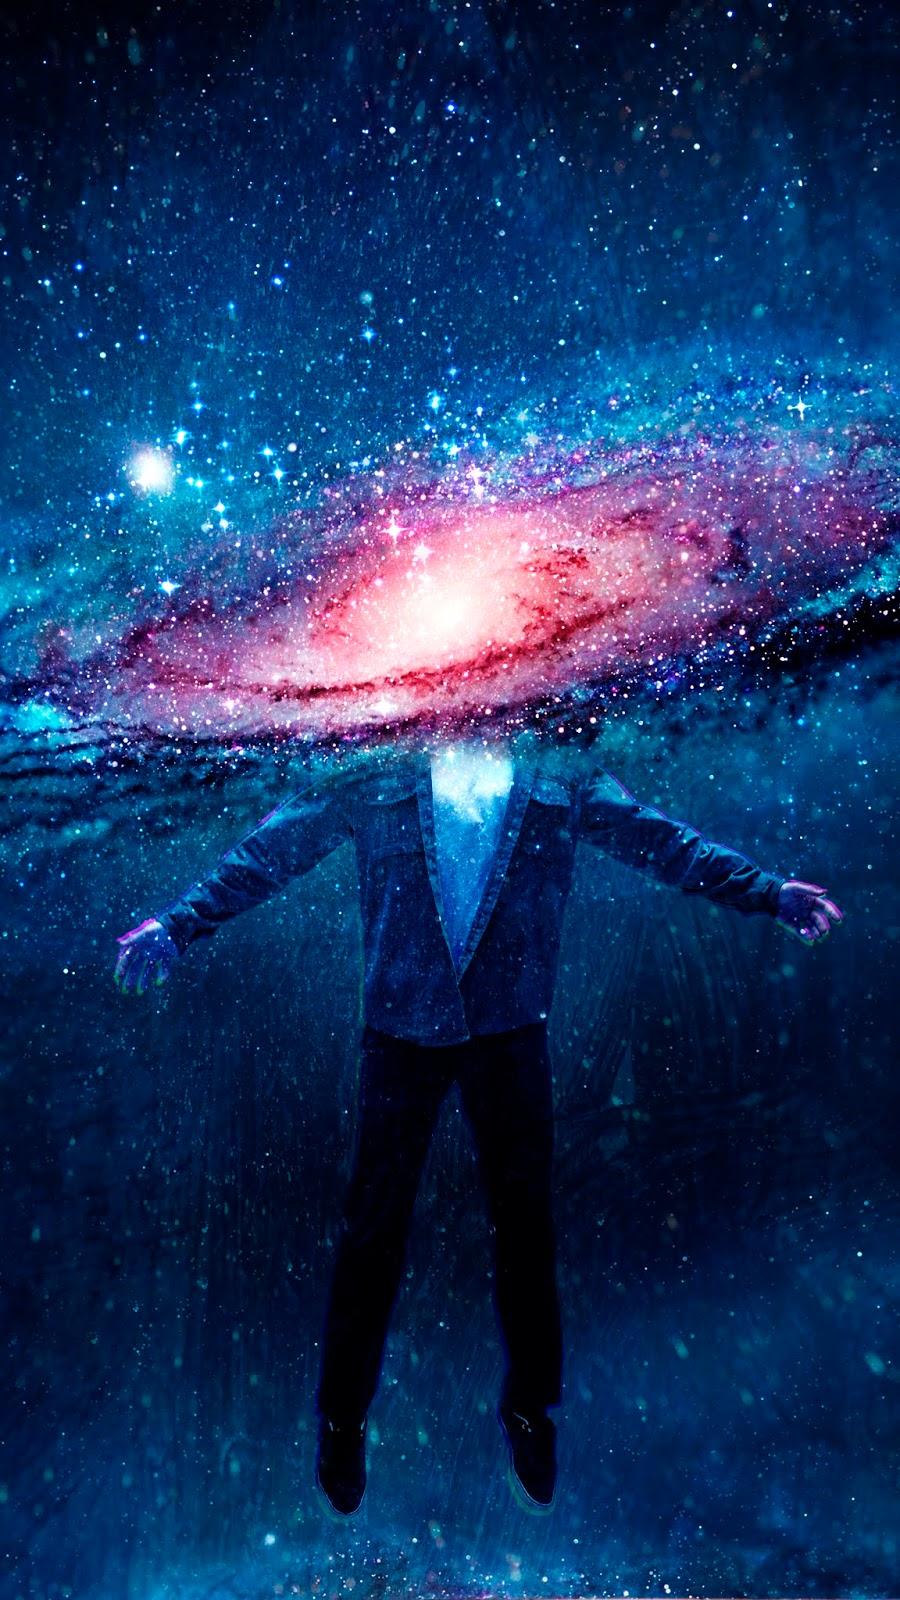 I'm the universe